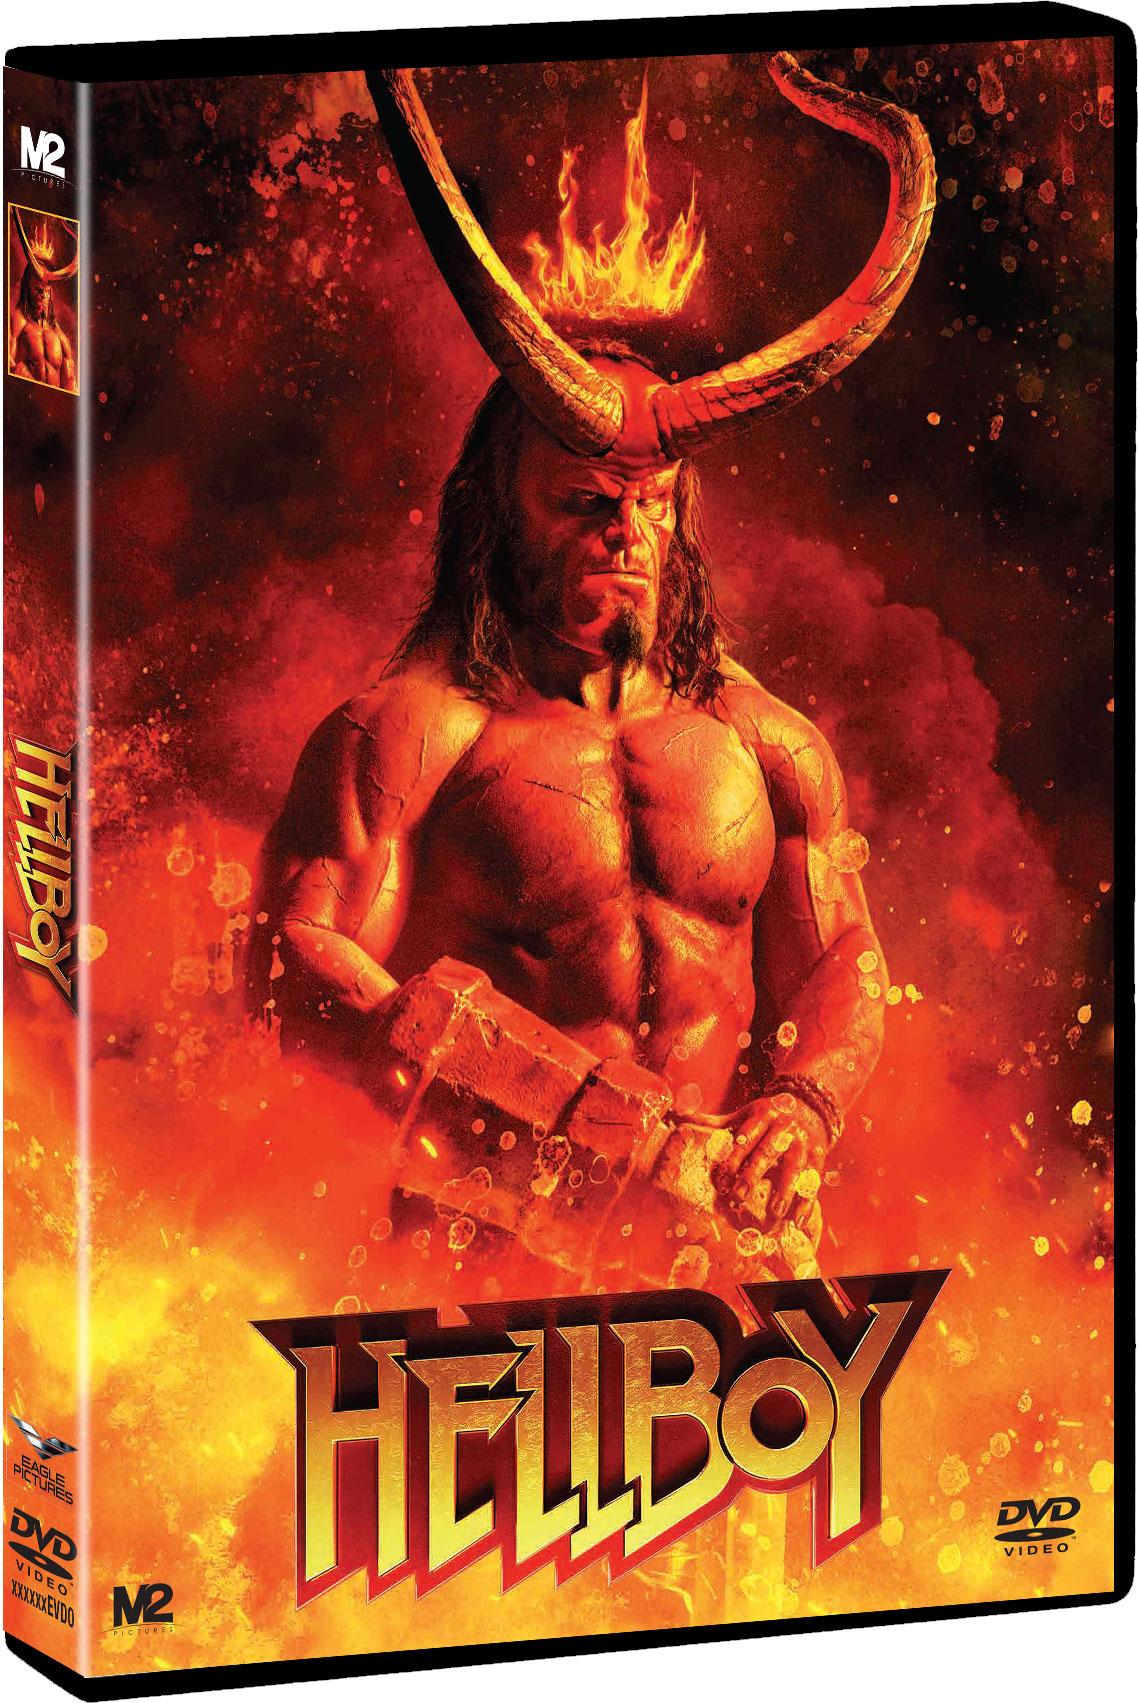 HELLBOY (DVD+CARD DA COLLEZIONE) (DVD)